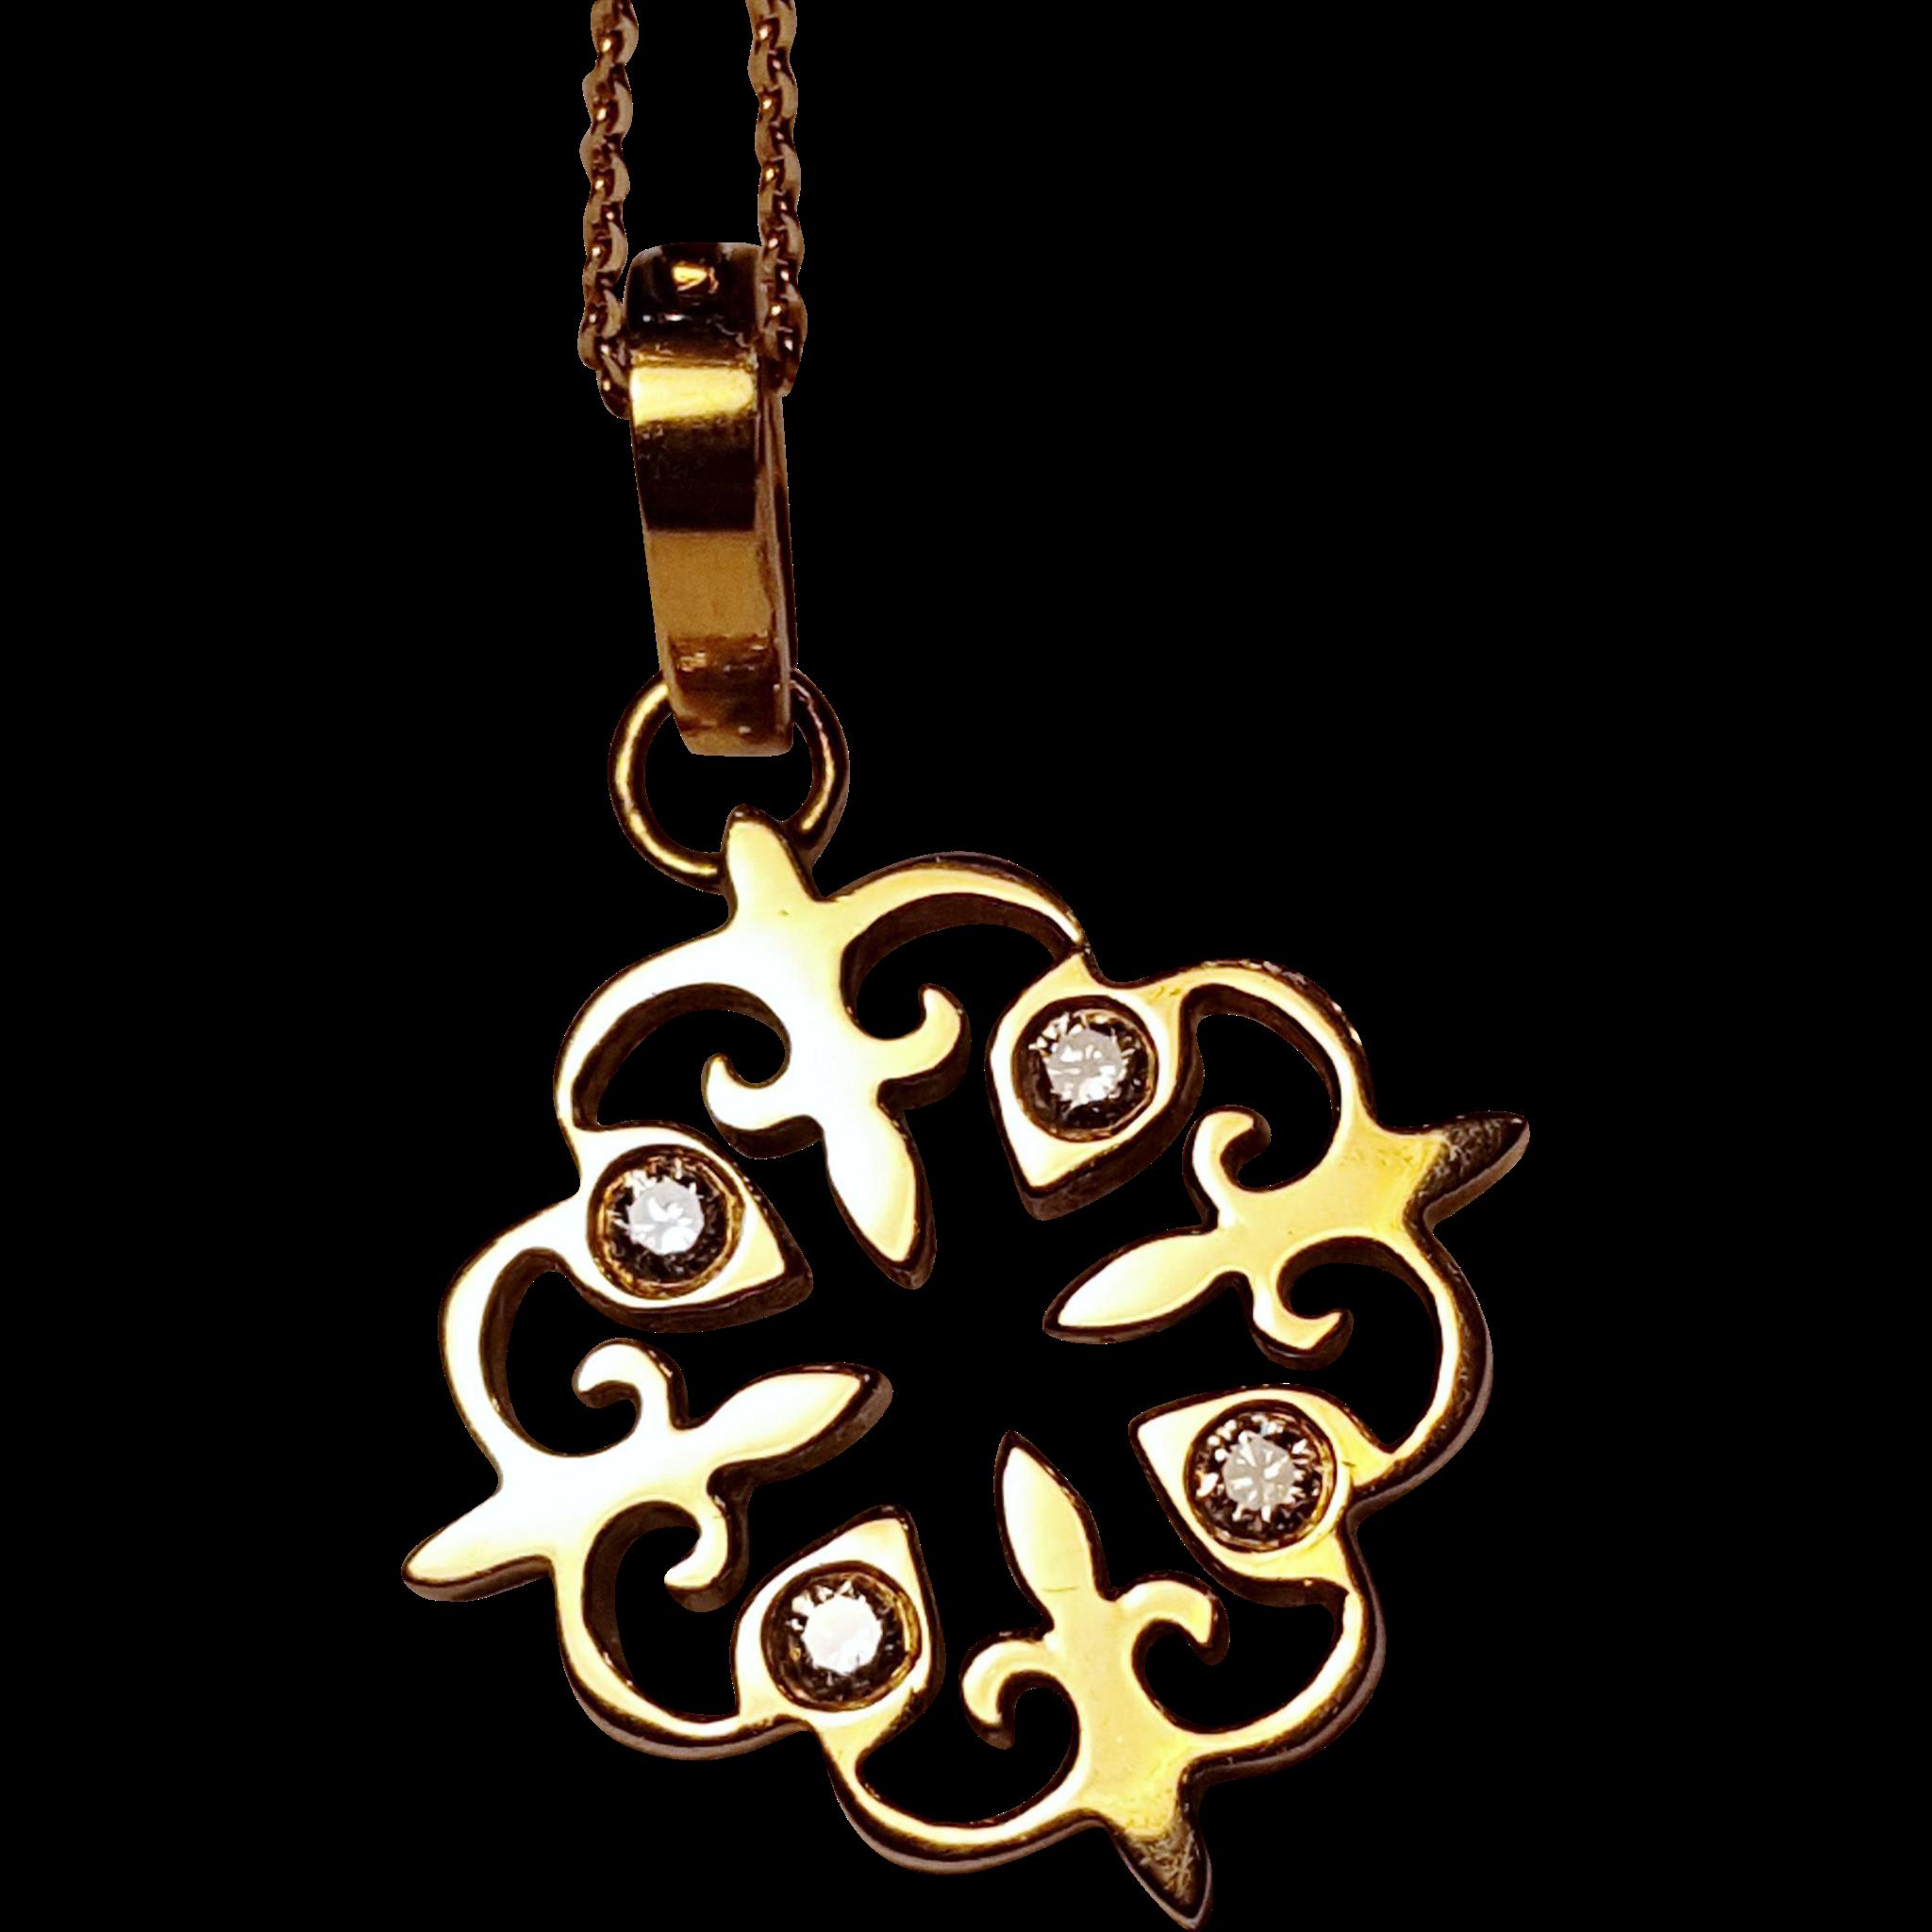 Jemily Fleur de Lis Diamond and 18k Gold Charm on 18k Gold Necklace